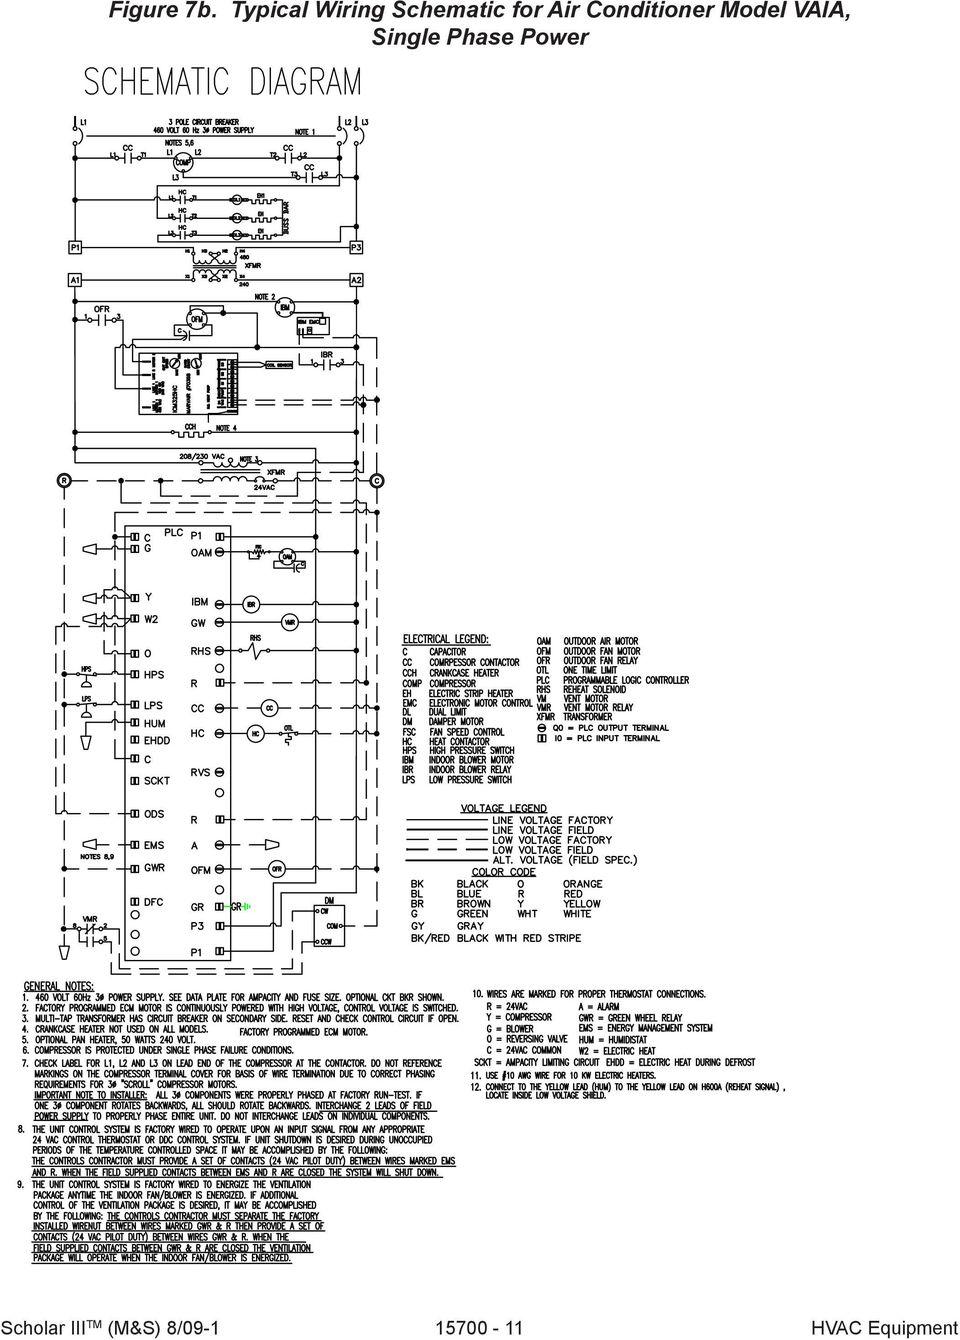 medium resolution of conditioner model vaia single